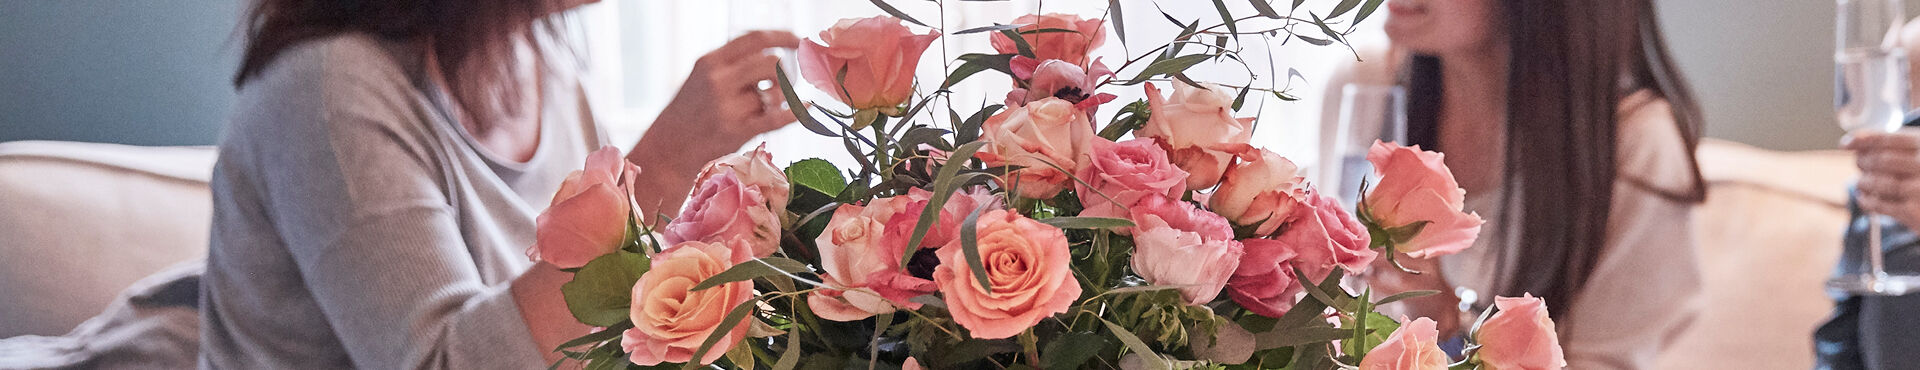 rosor skötselråd